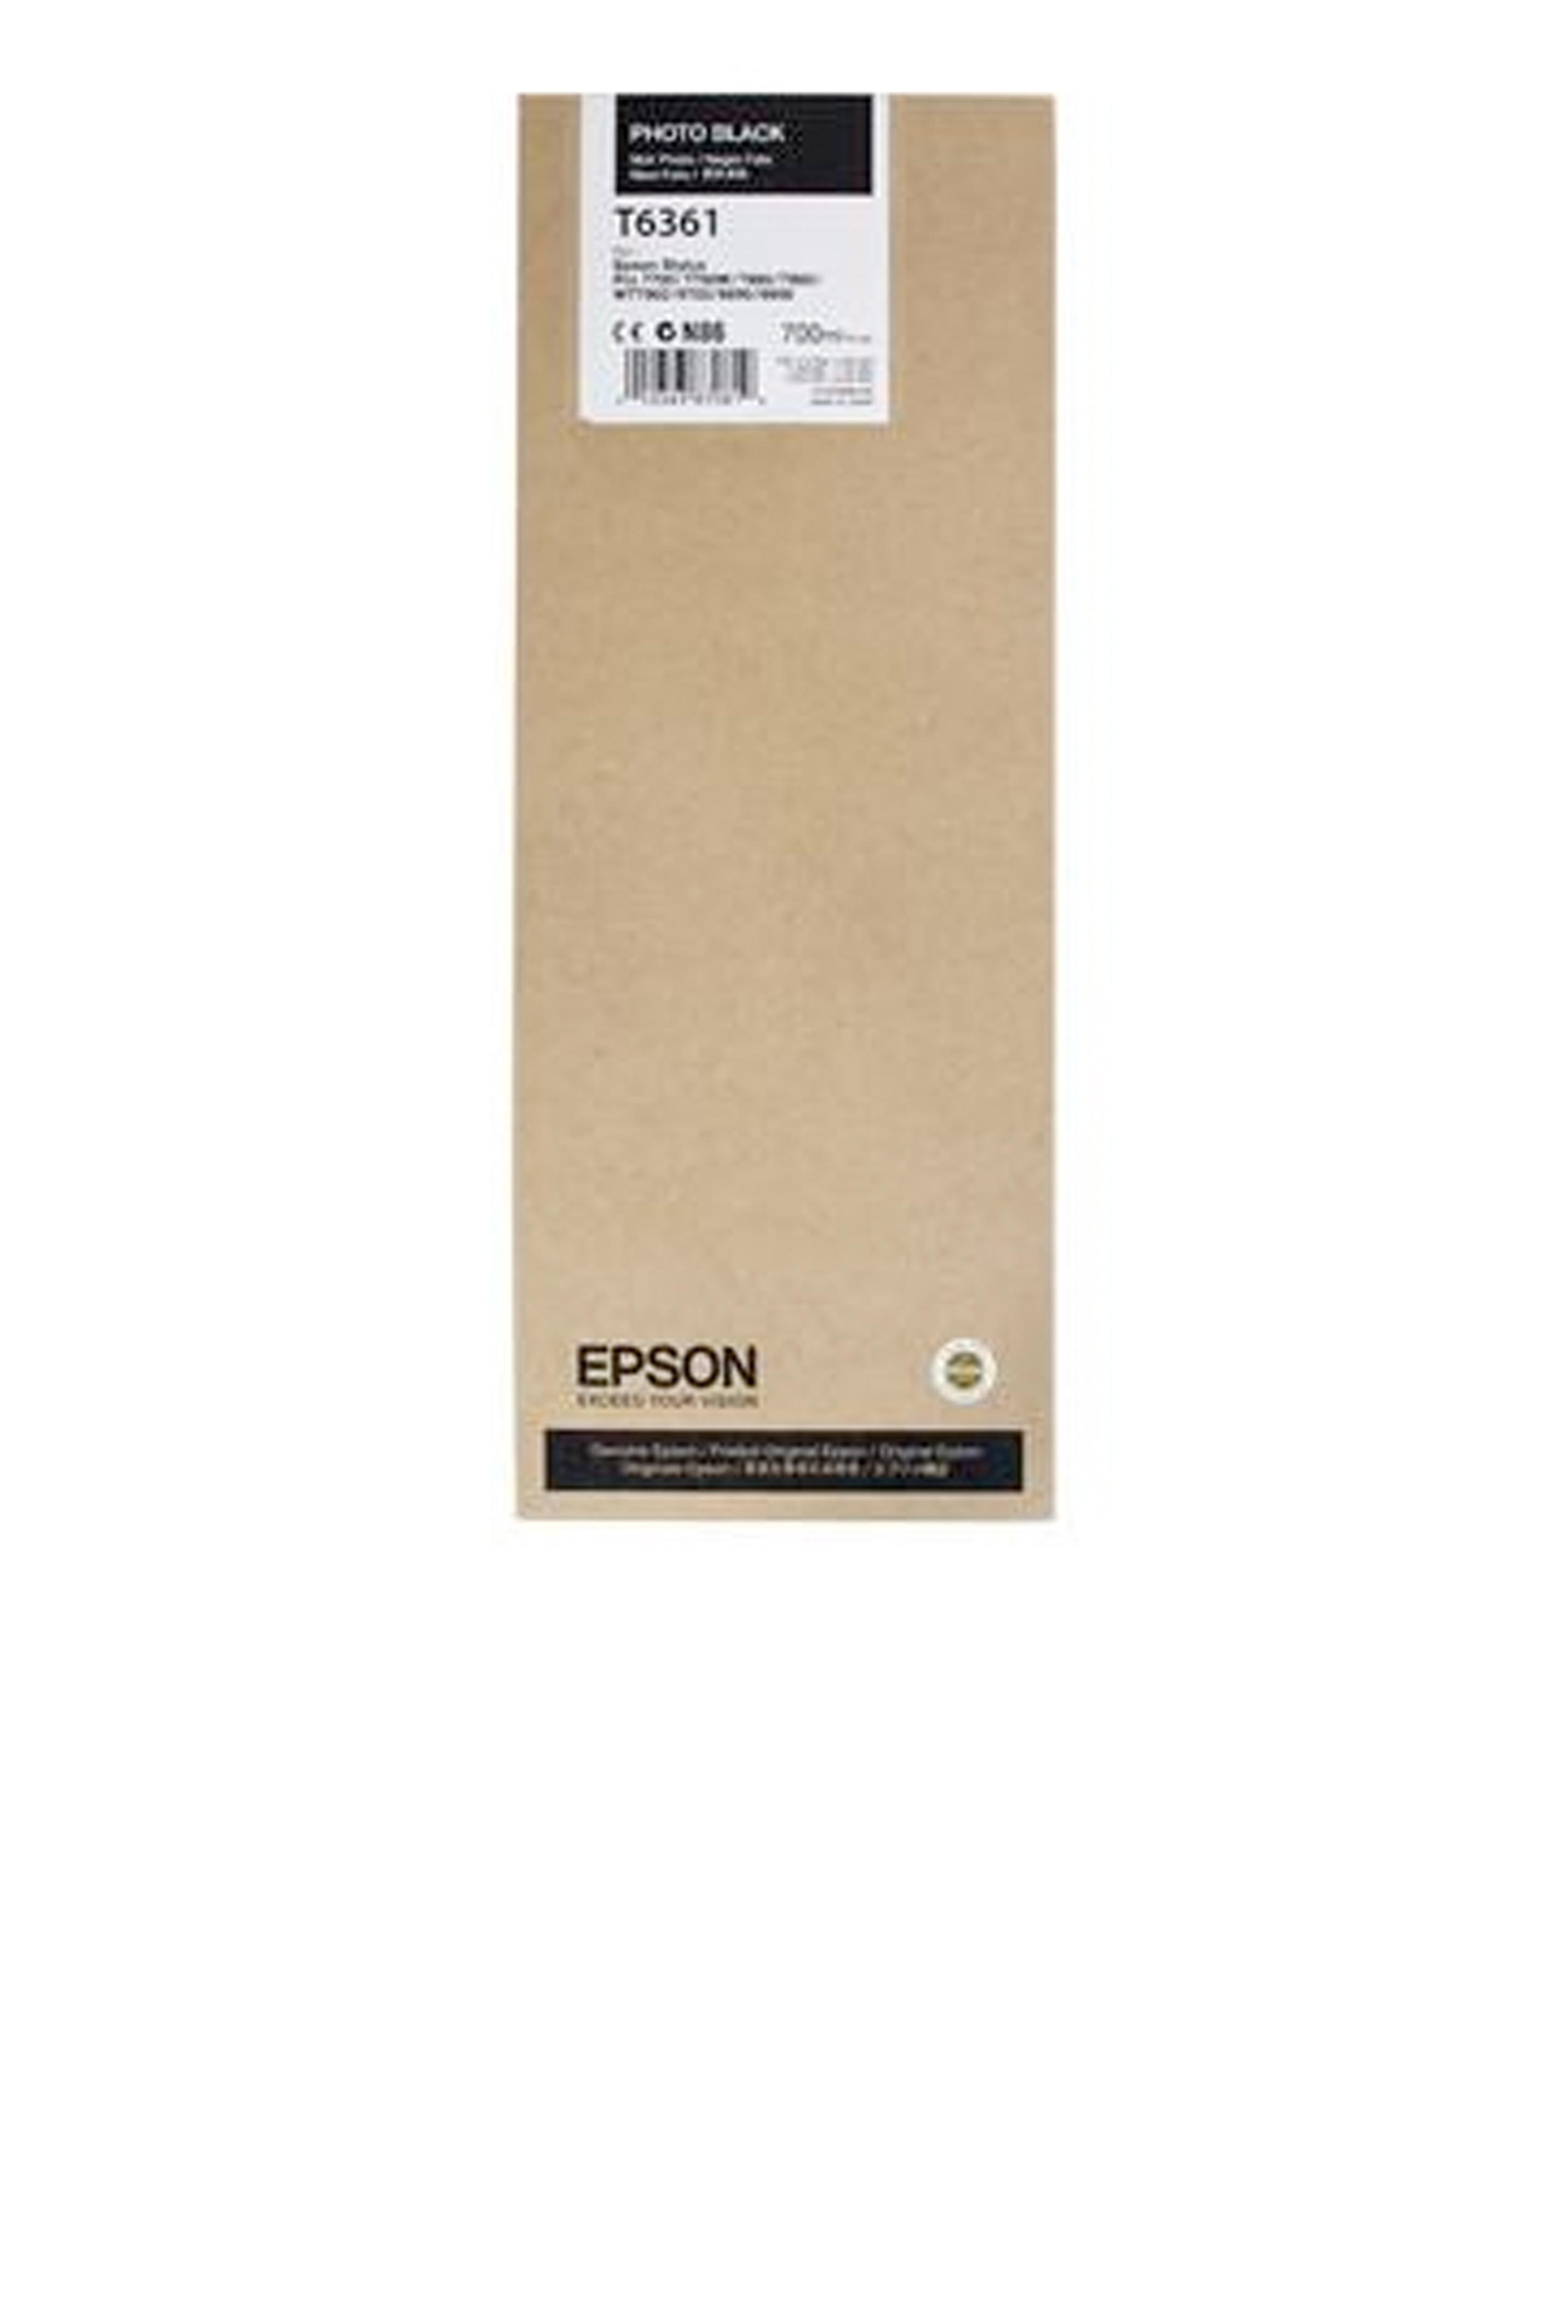 Epson EPSON HI PHOTO BLACK INK (700 ML) (T636100)